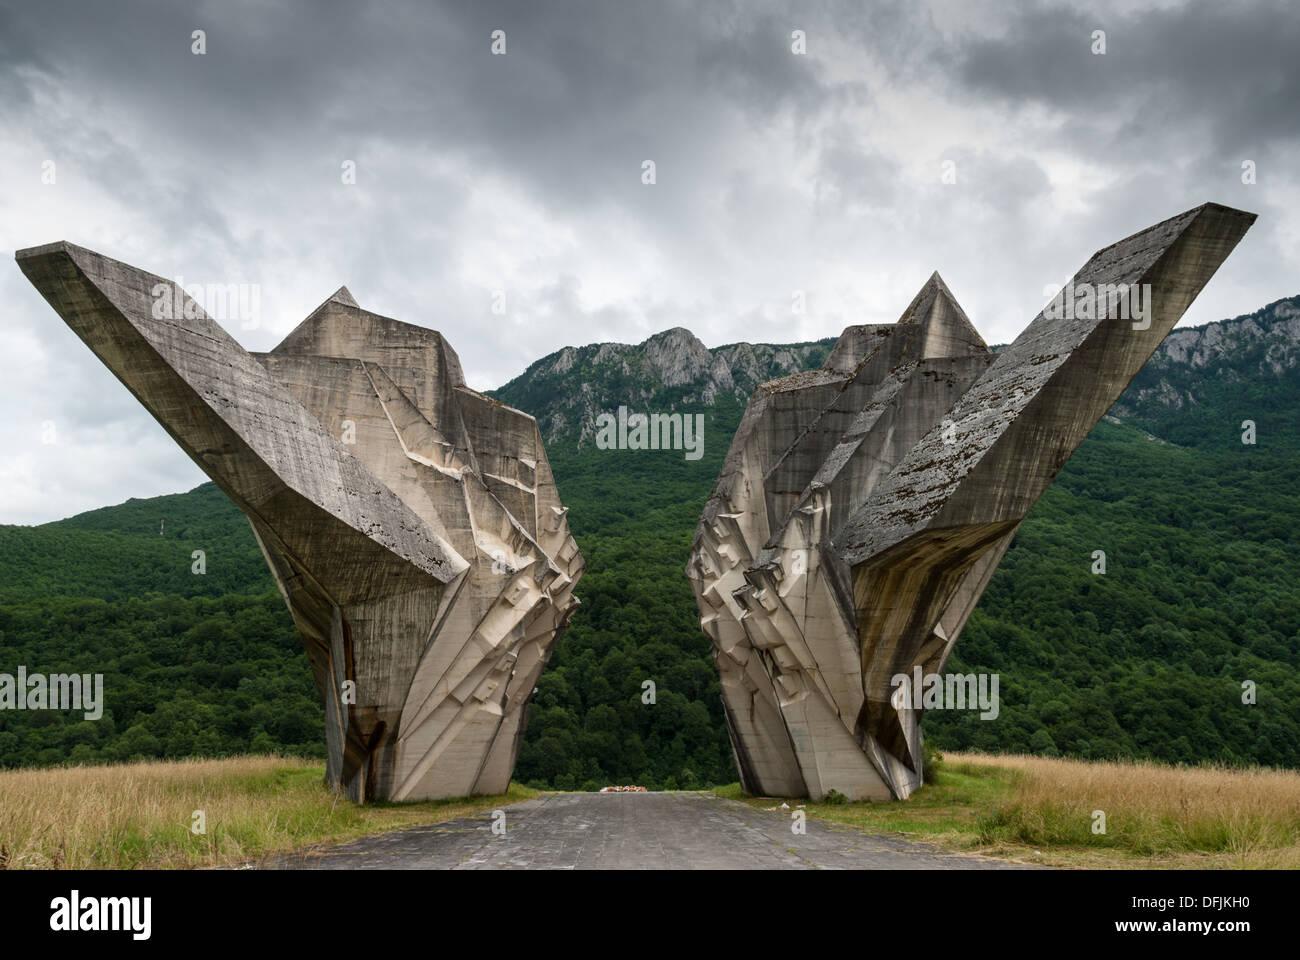 The World War II monument in Sutjeska National Park, Bosnia and Herzegovina - Stock Image